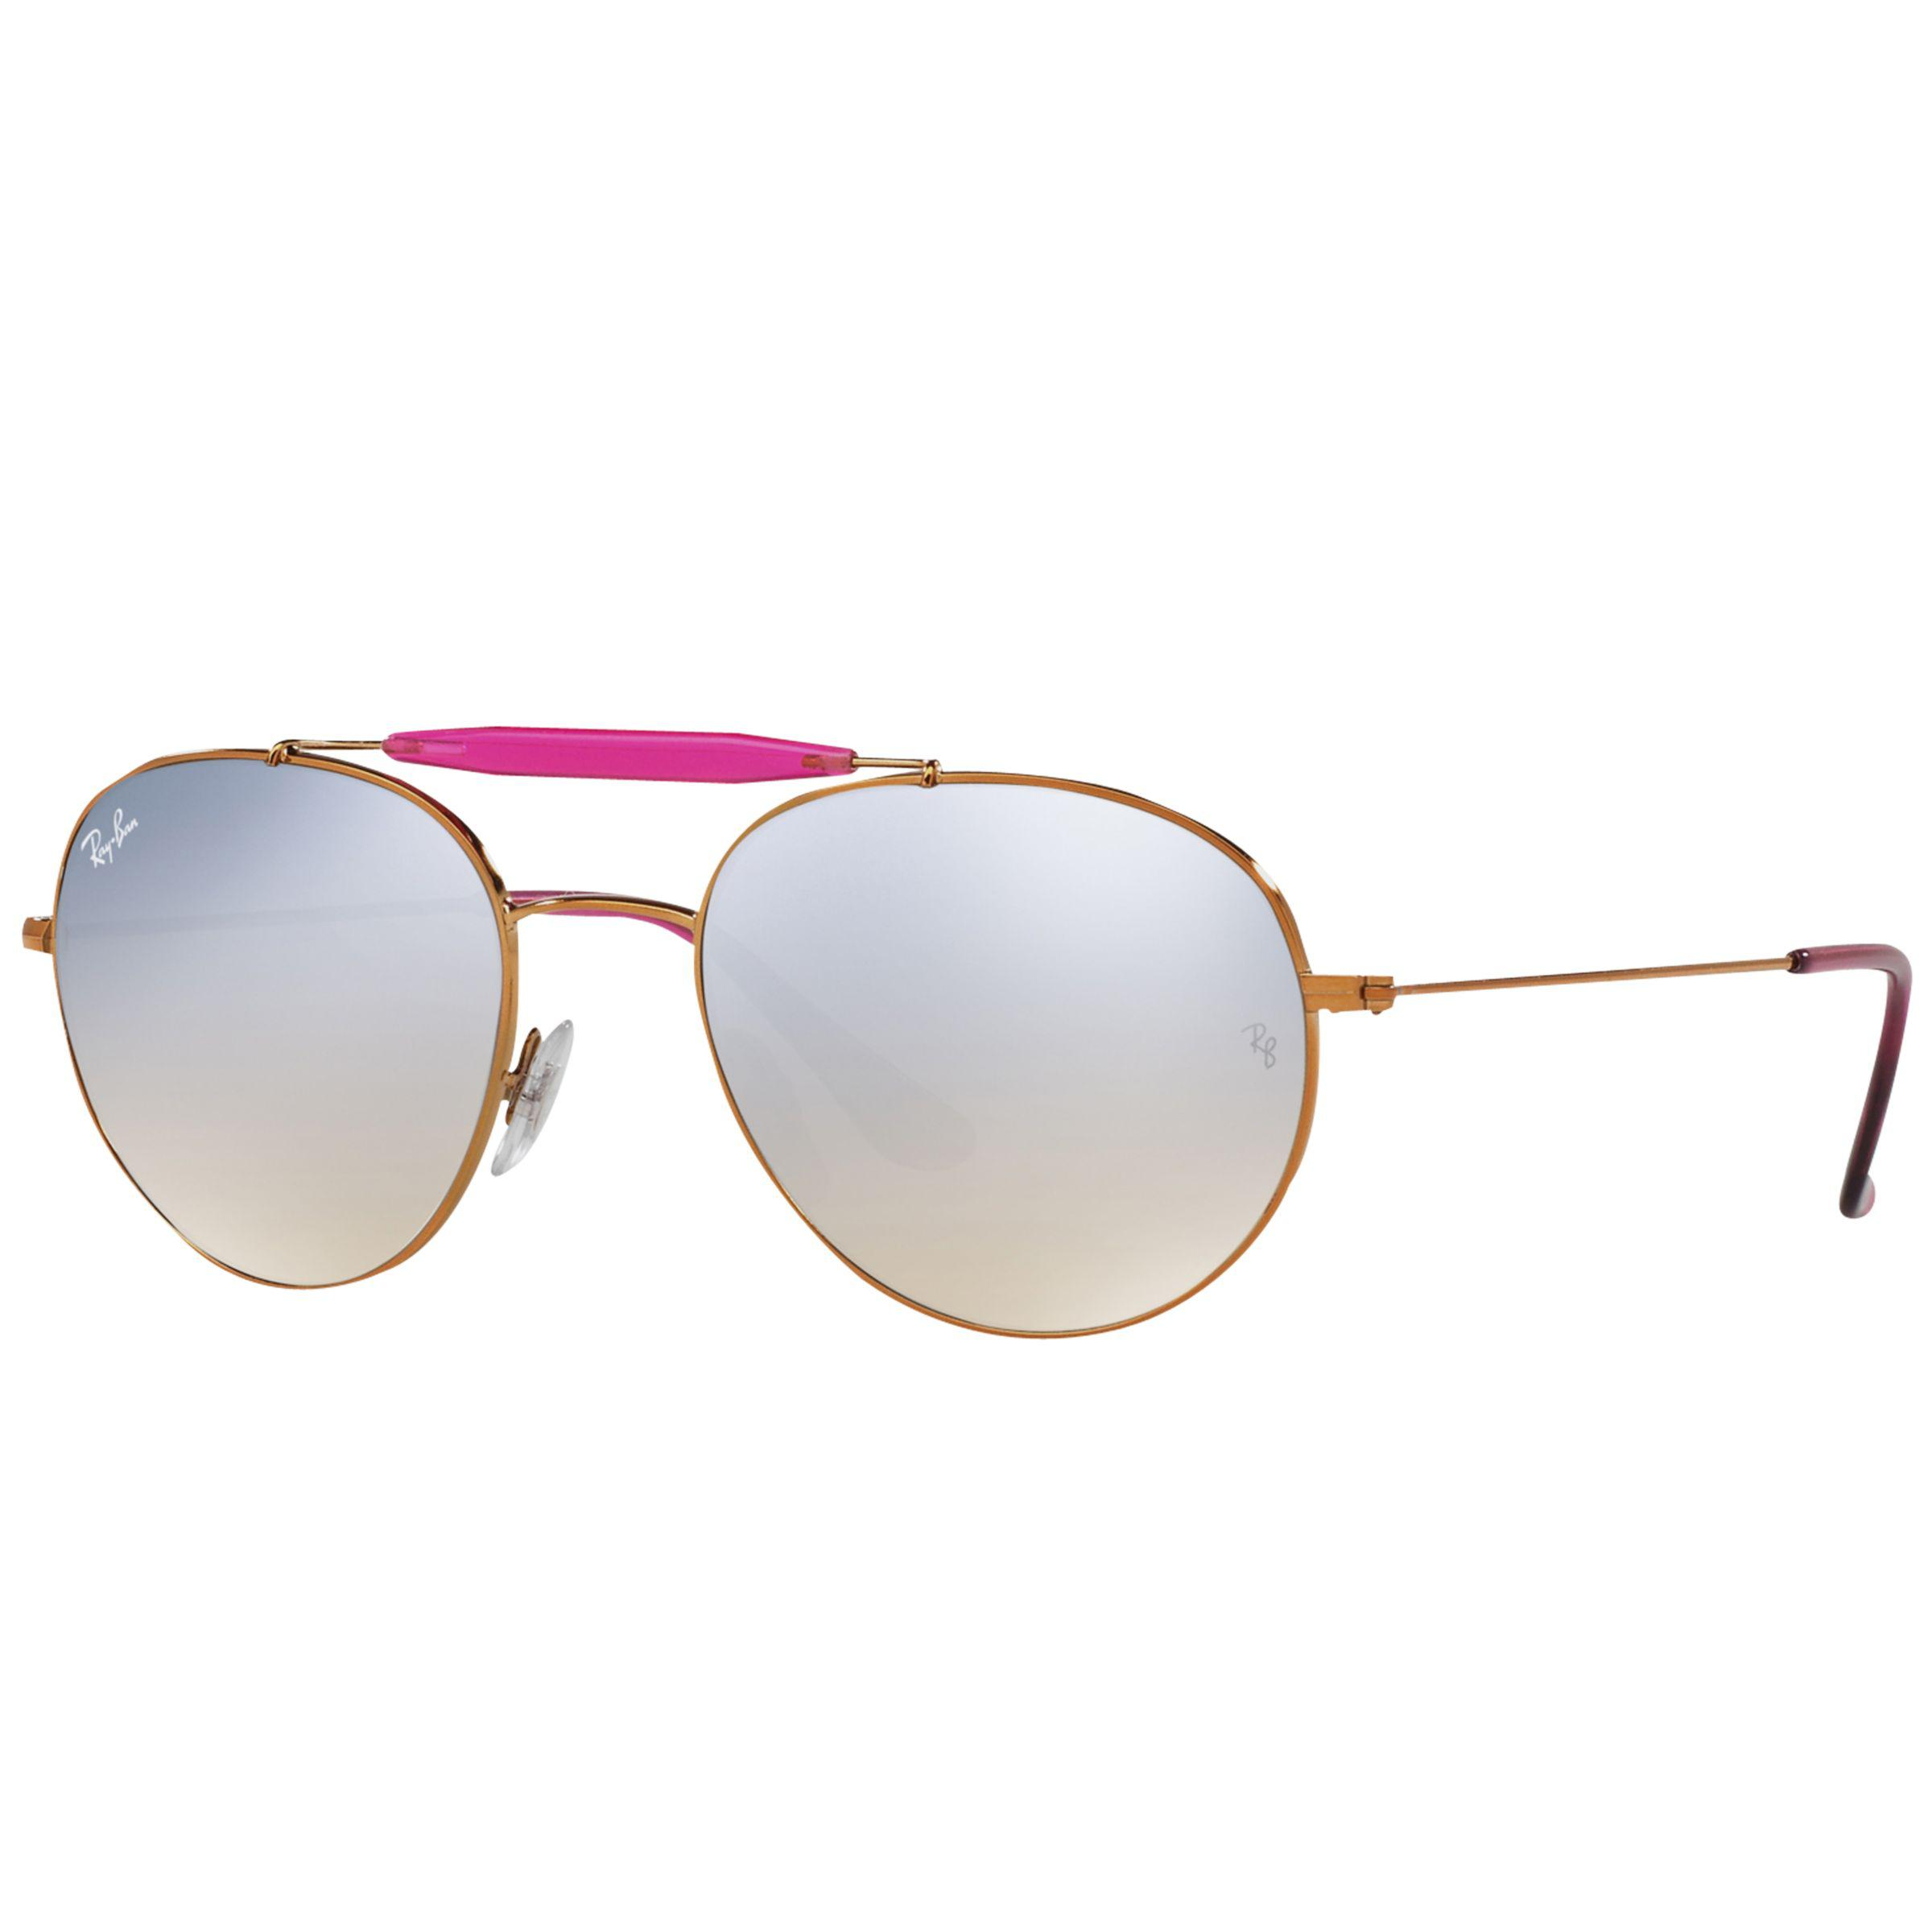 69398291128b7 Ray-Ban Rb3540 Oval Sunglasses in Metallic - Lyst